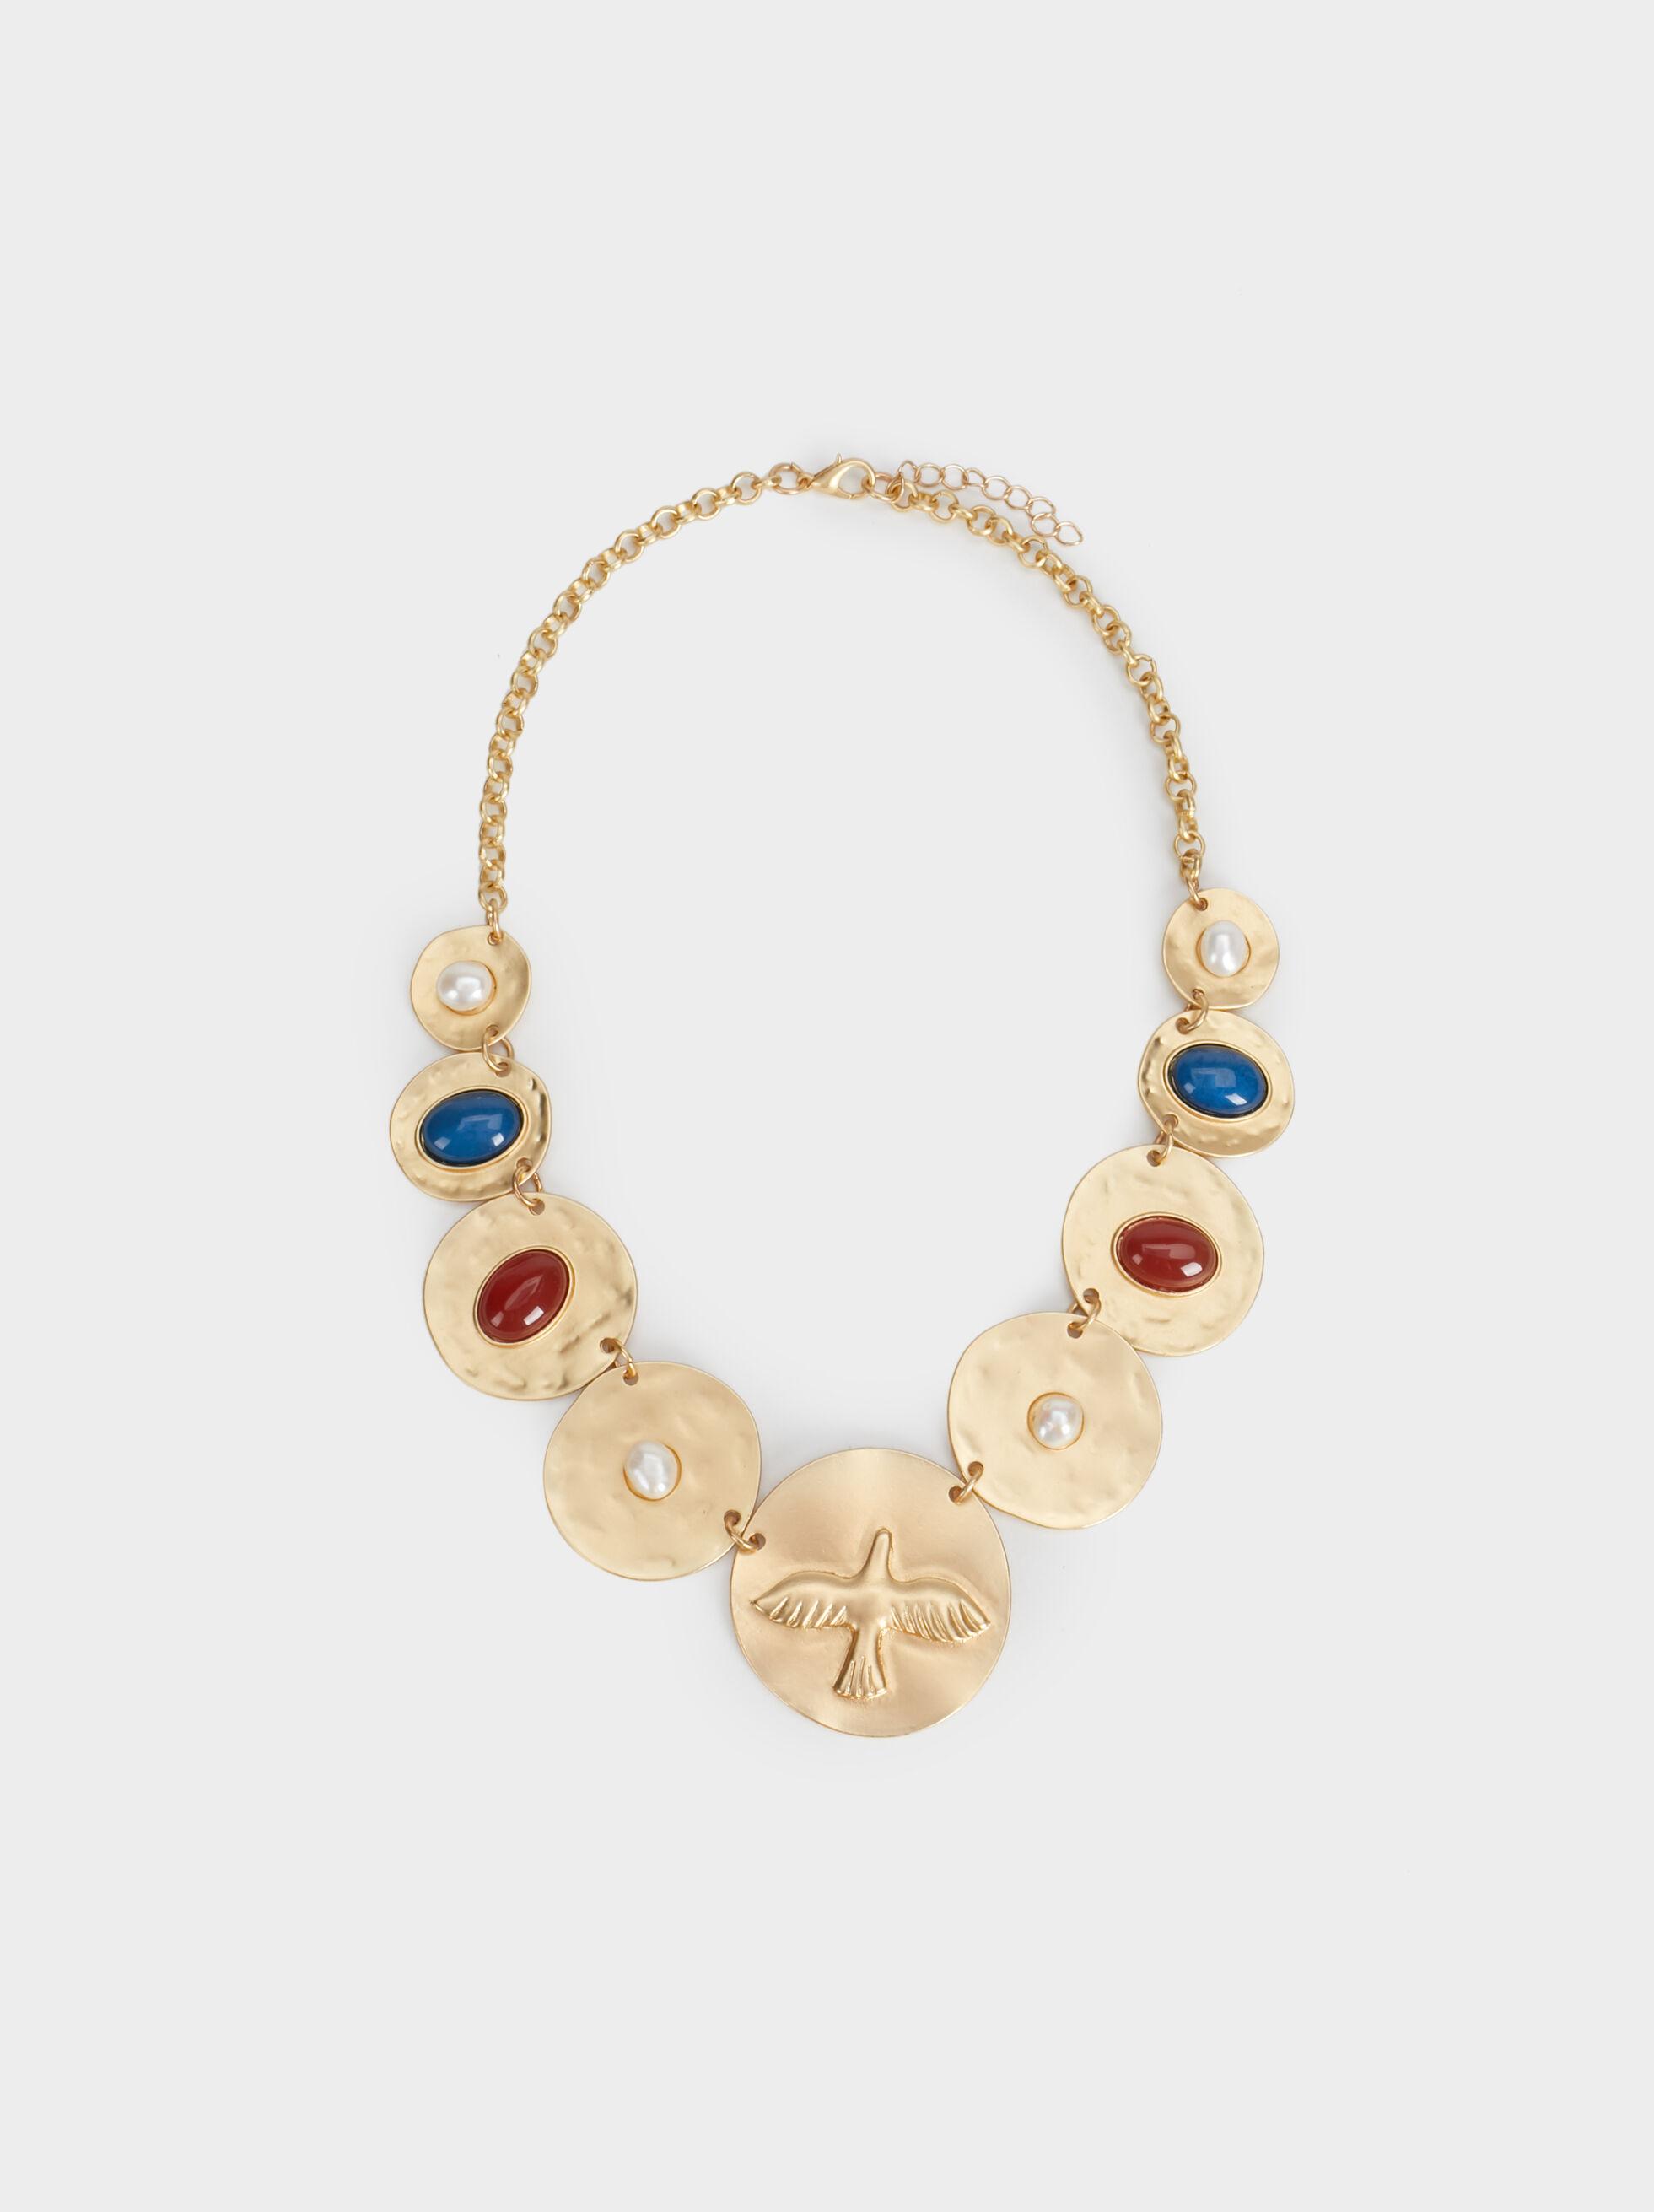 Zorba Short Necklace With Medallions, Multicolor, hi-res